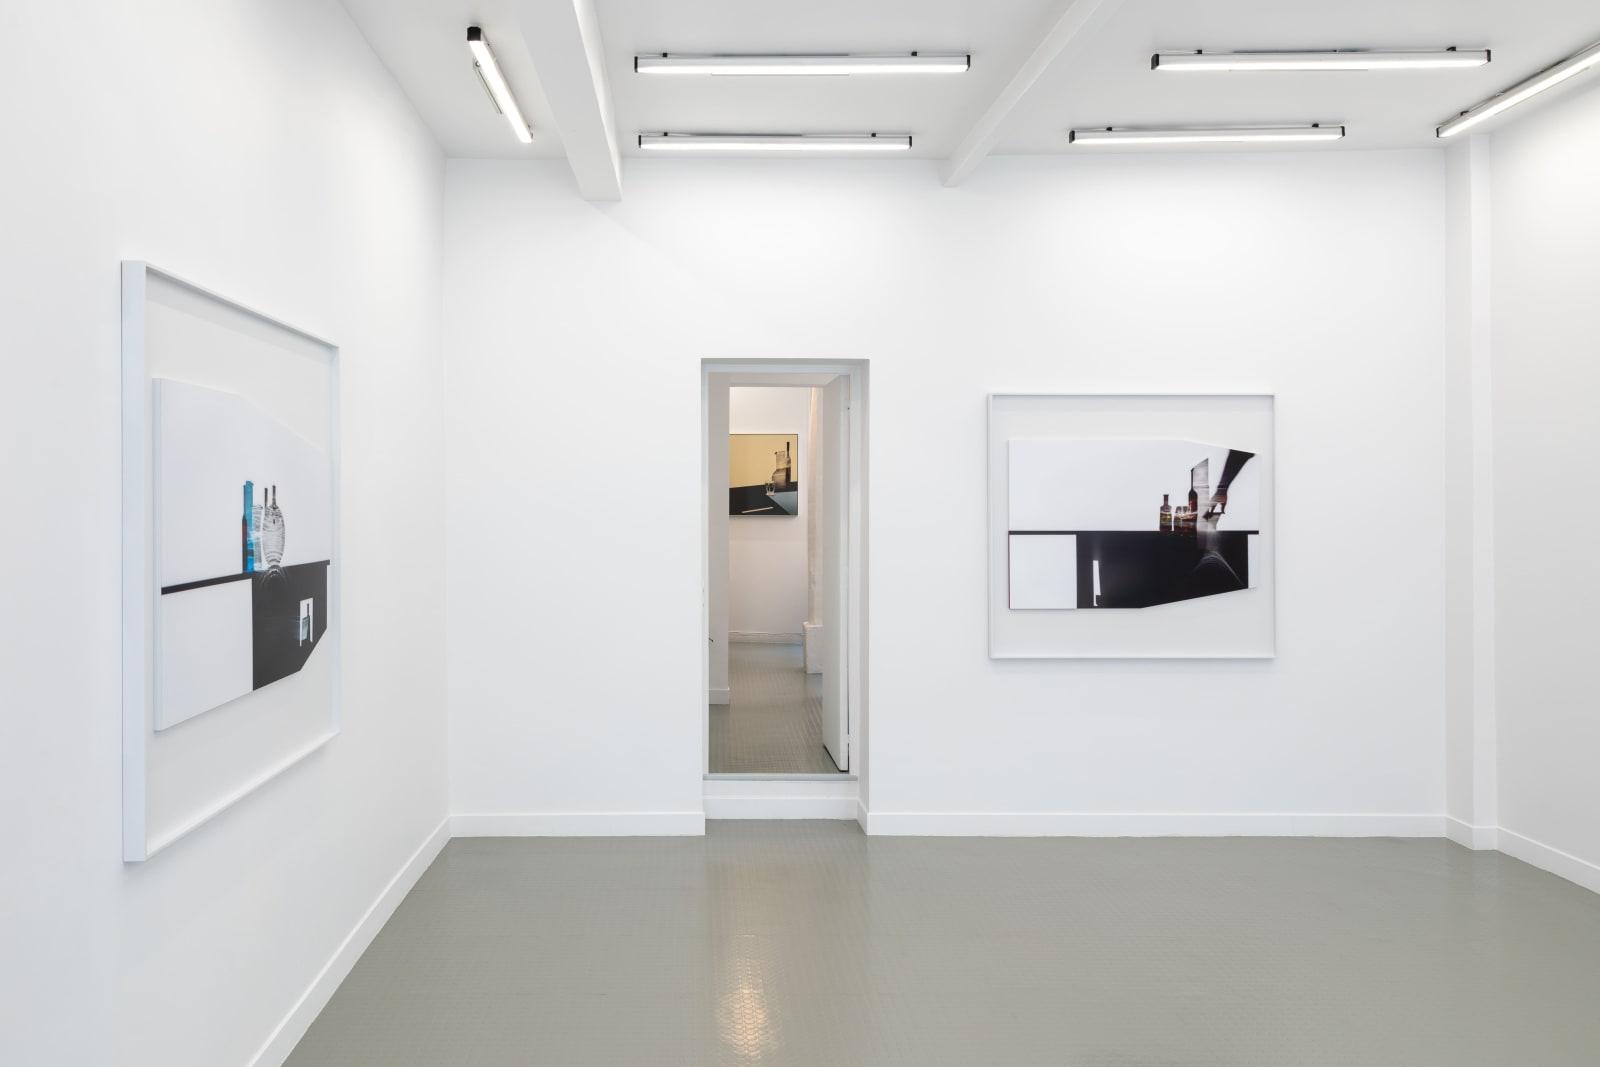 Uta Barth Installation view, Andréhn-Schiptjenko, Paris, France, 2021.